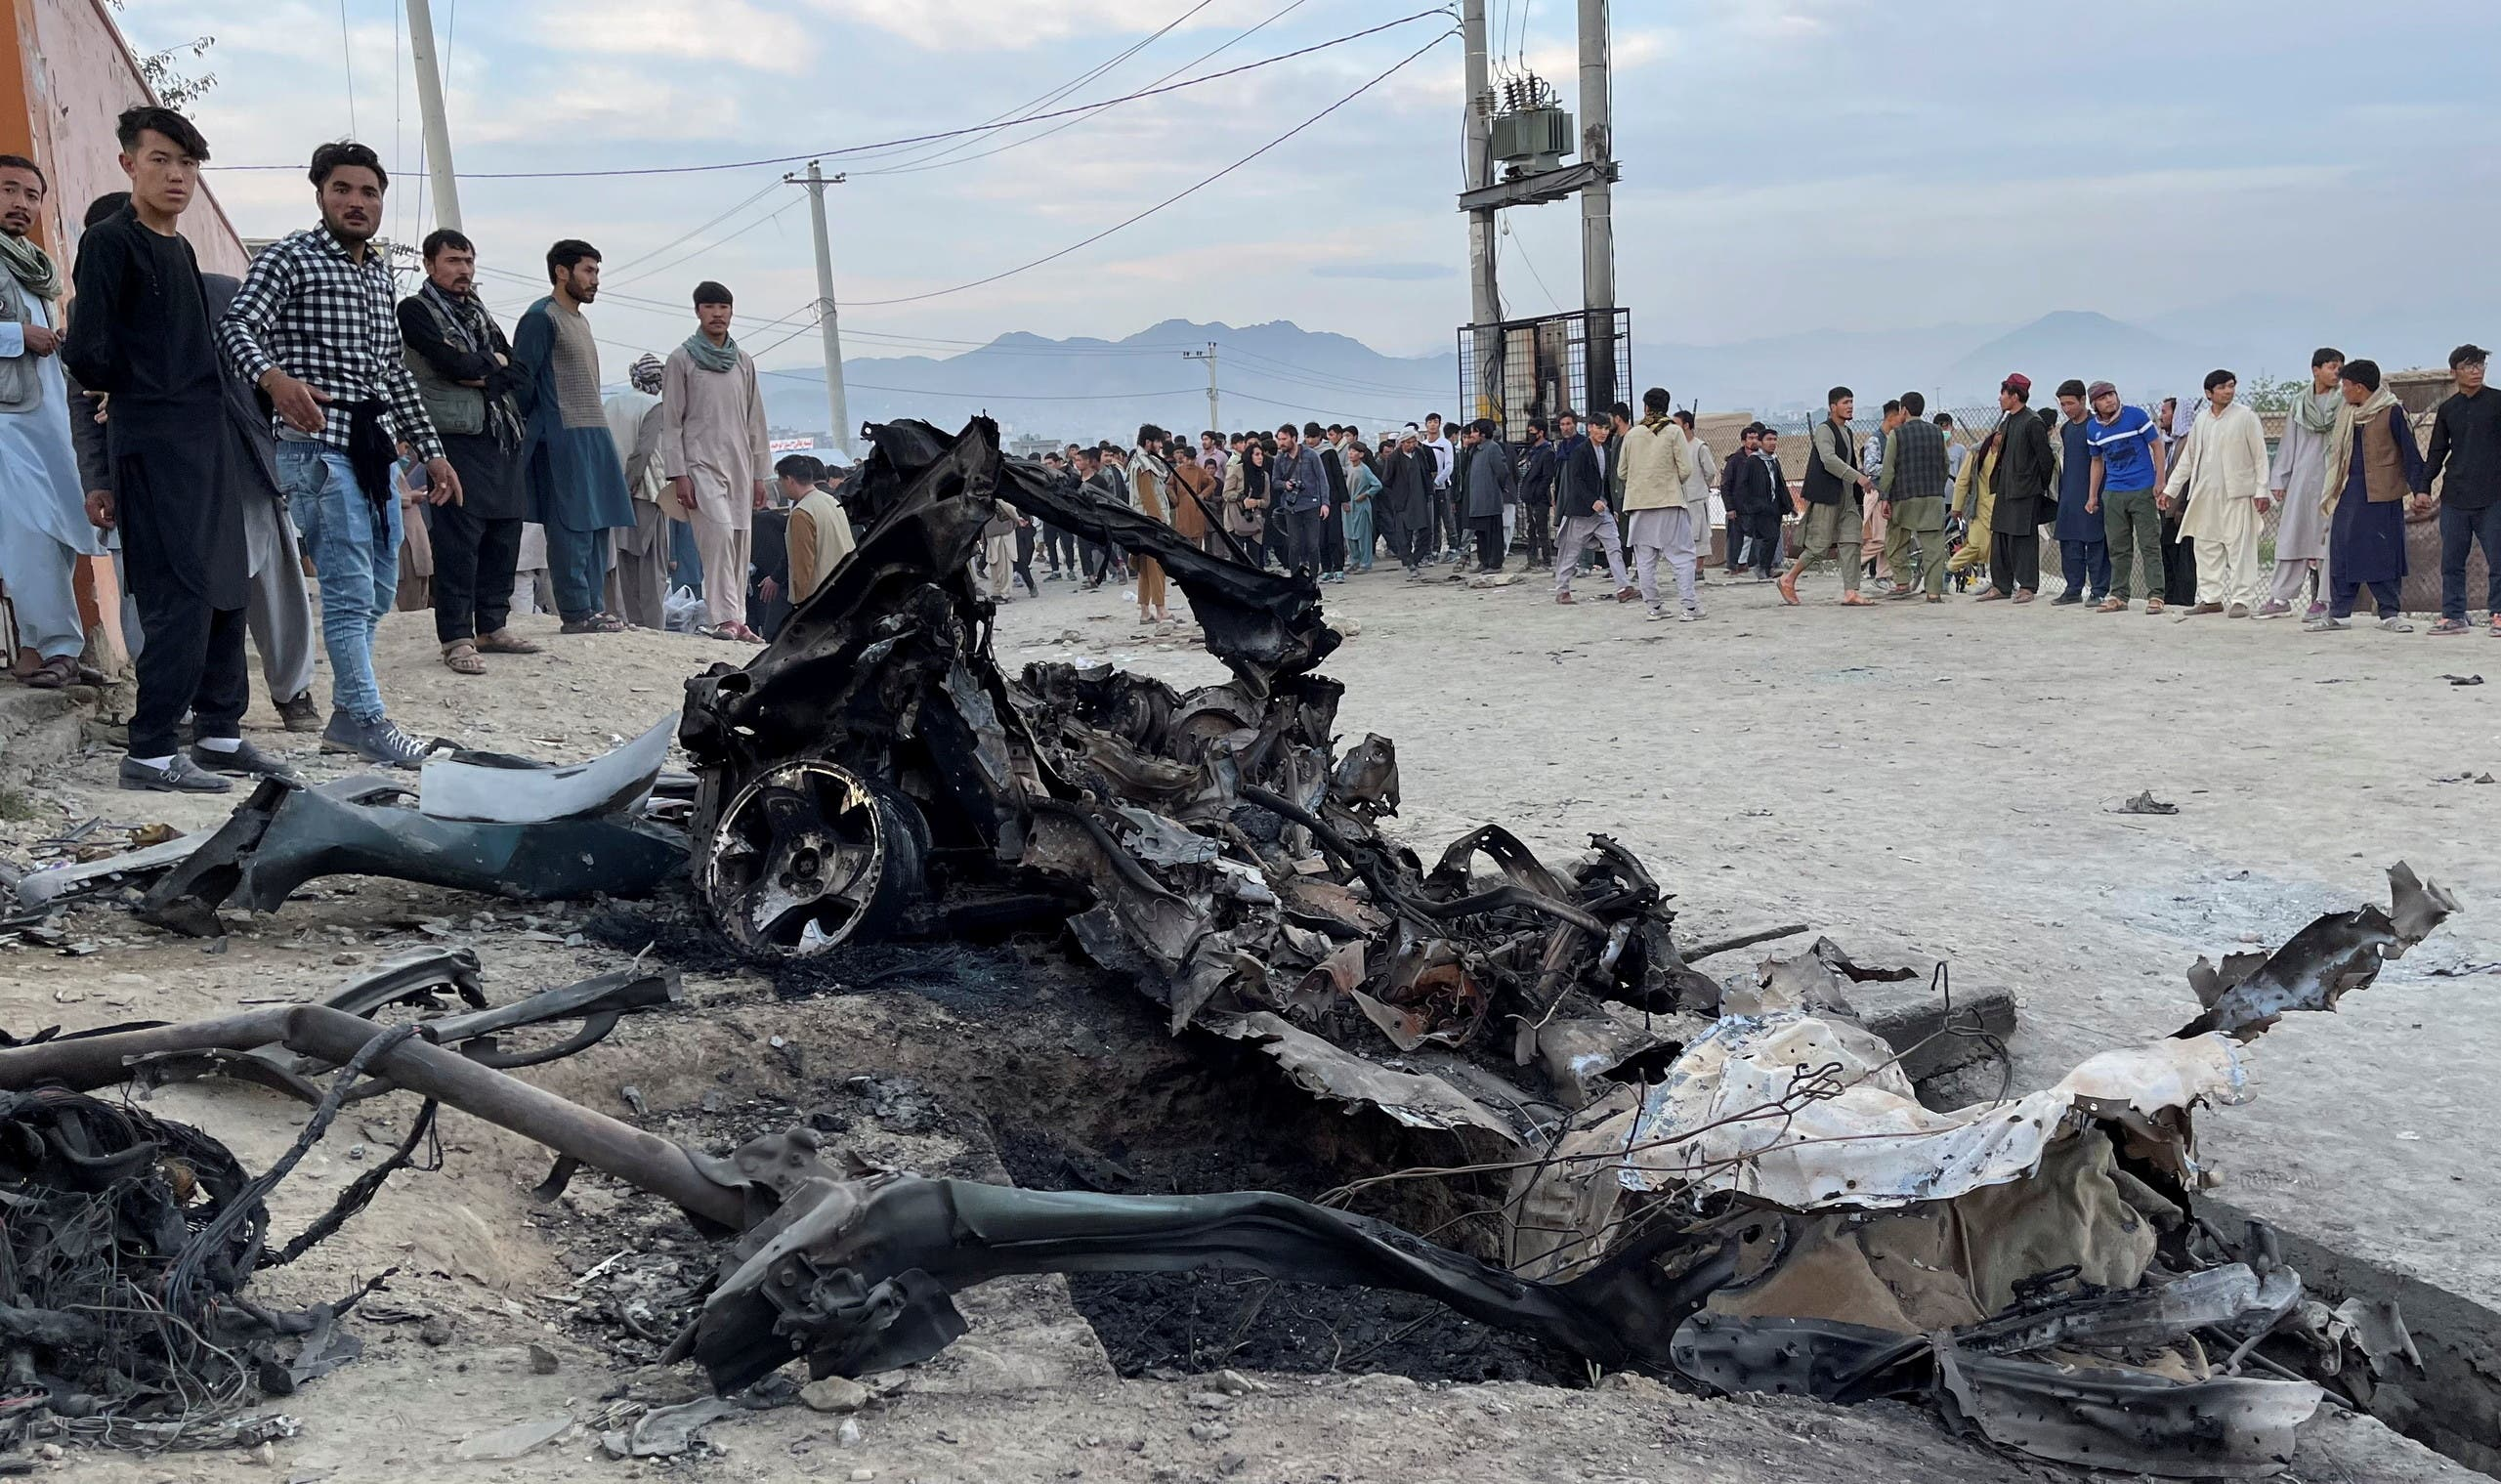 انفجار مقابل مکتب در کابل